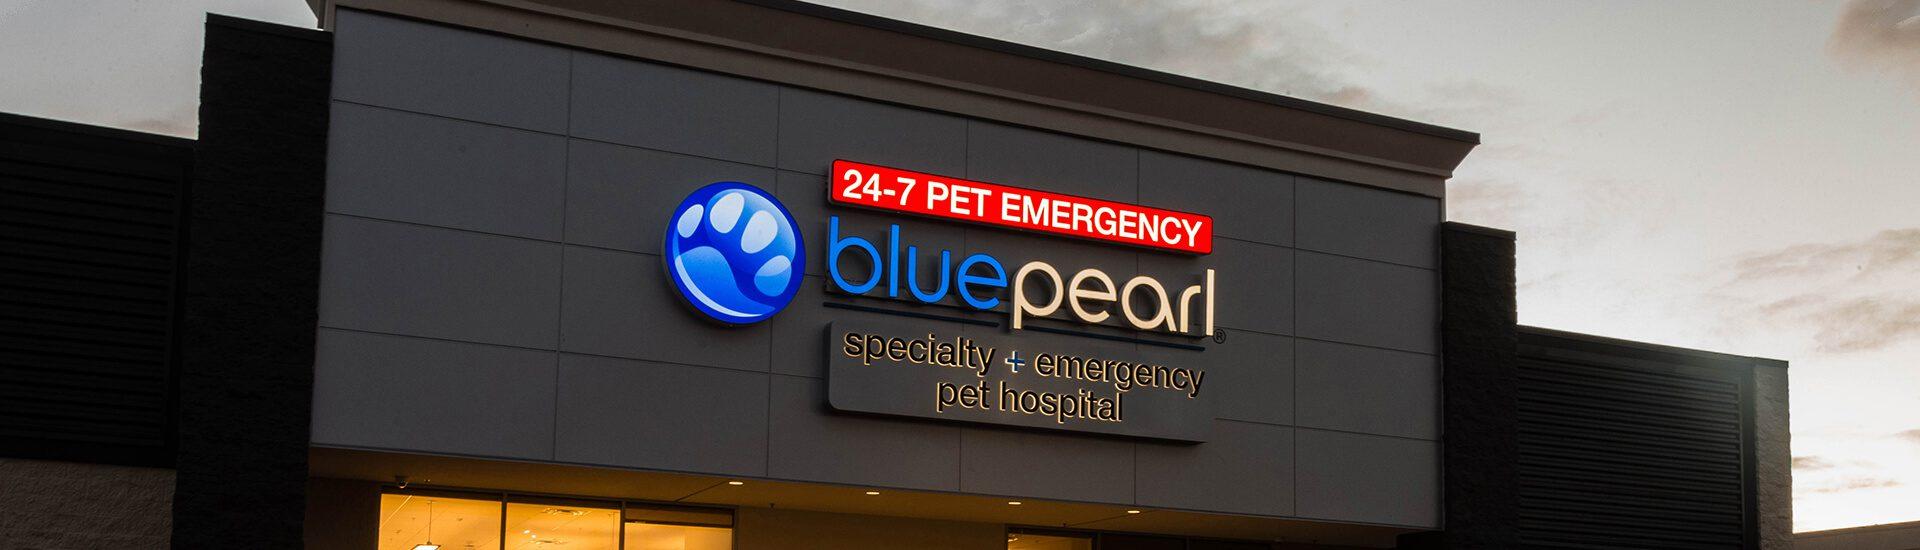 bluepearl pet hospital north seattle wa emergency vet. Black Bedroom Furniture Sets. Home Design Ideas